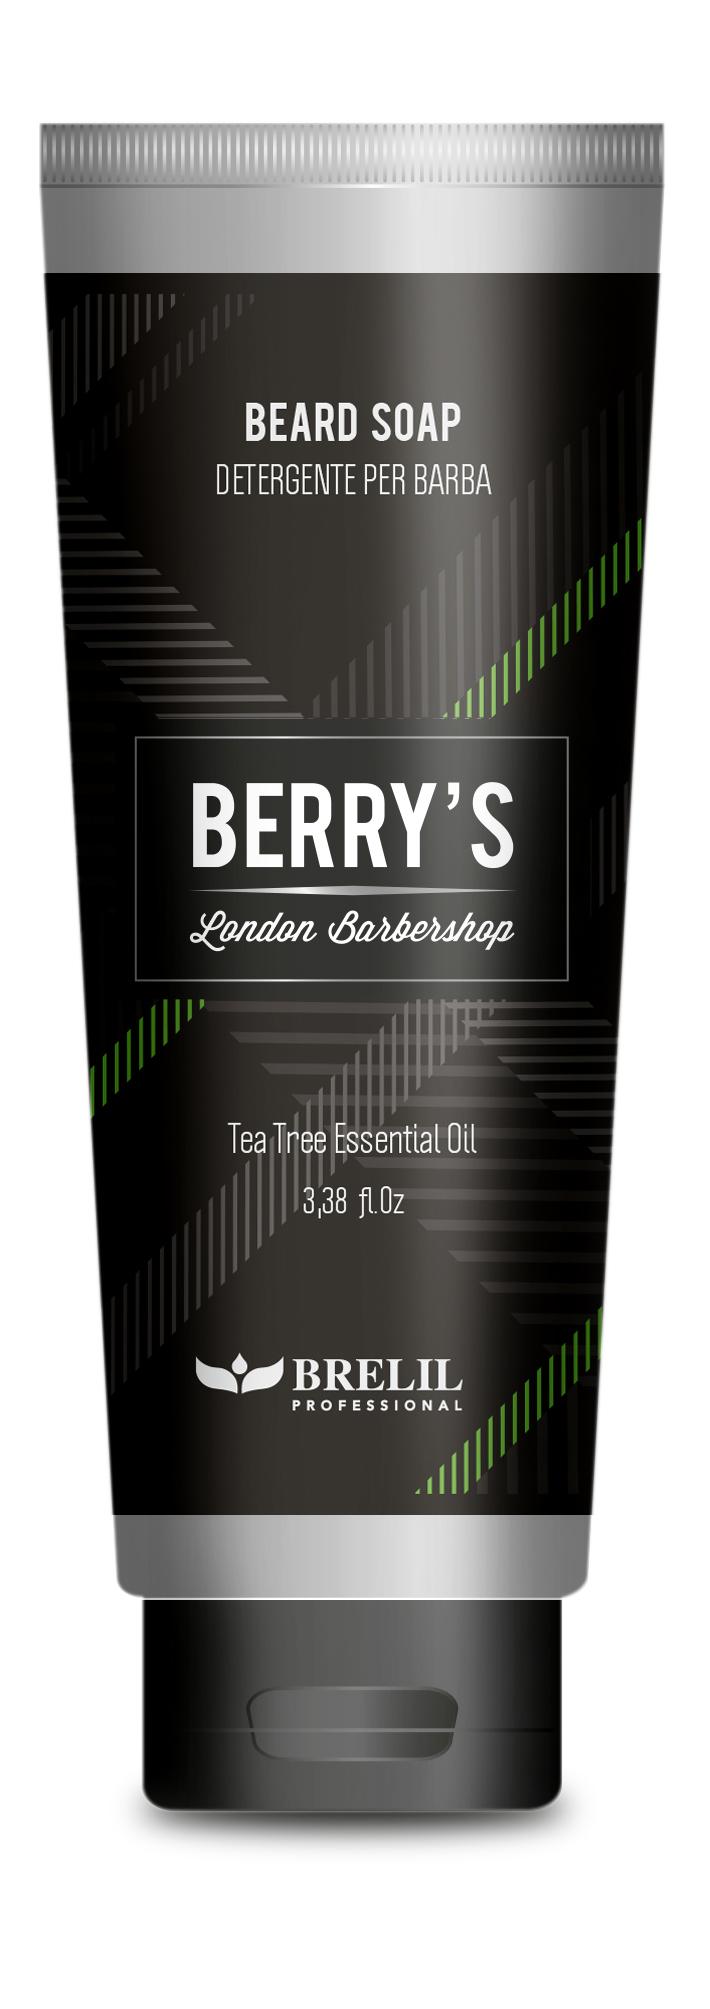 BERRY'S soap.jpg